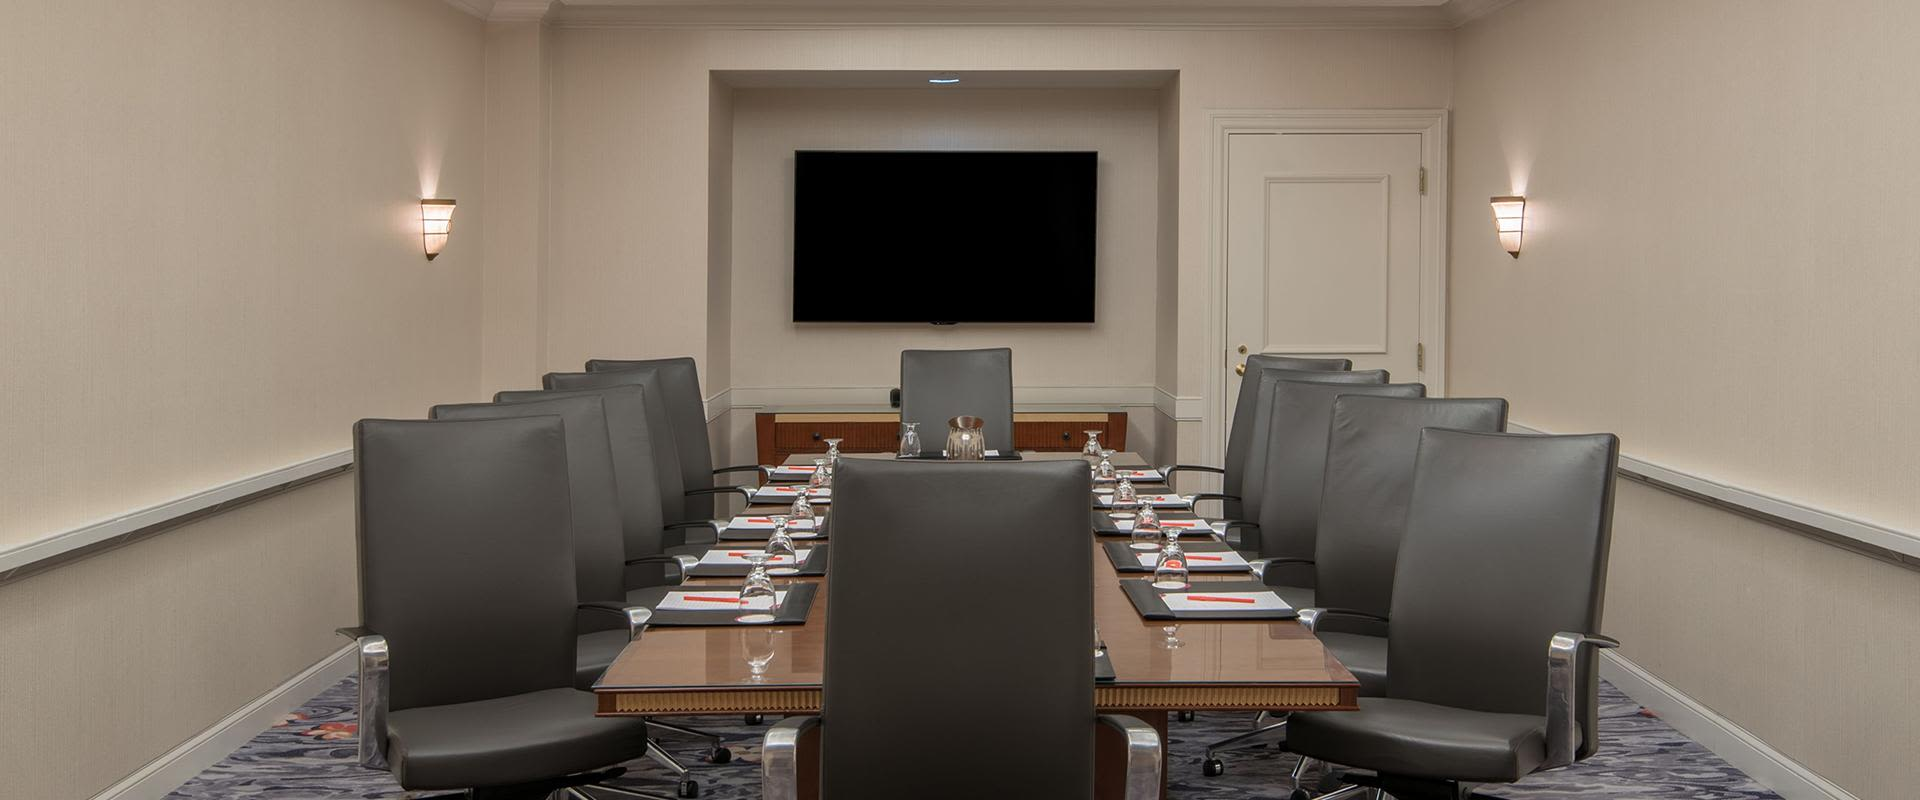 Charlotte Hotel Meeting Room Boardroom